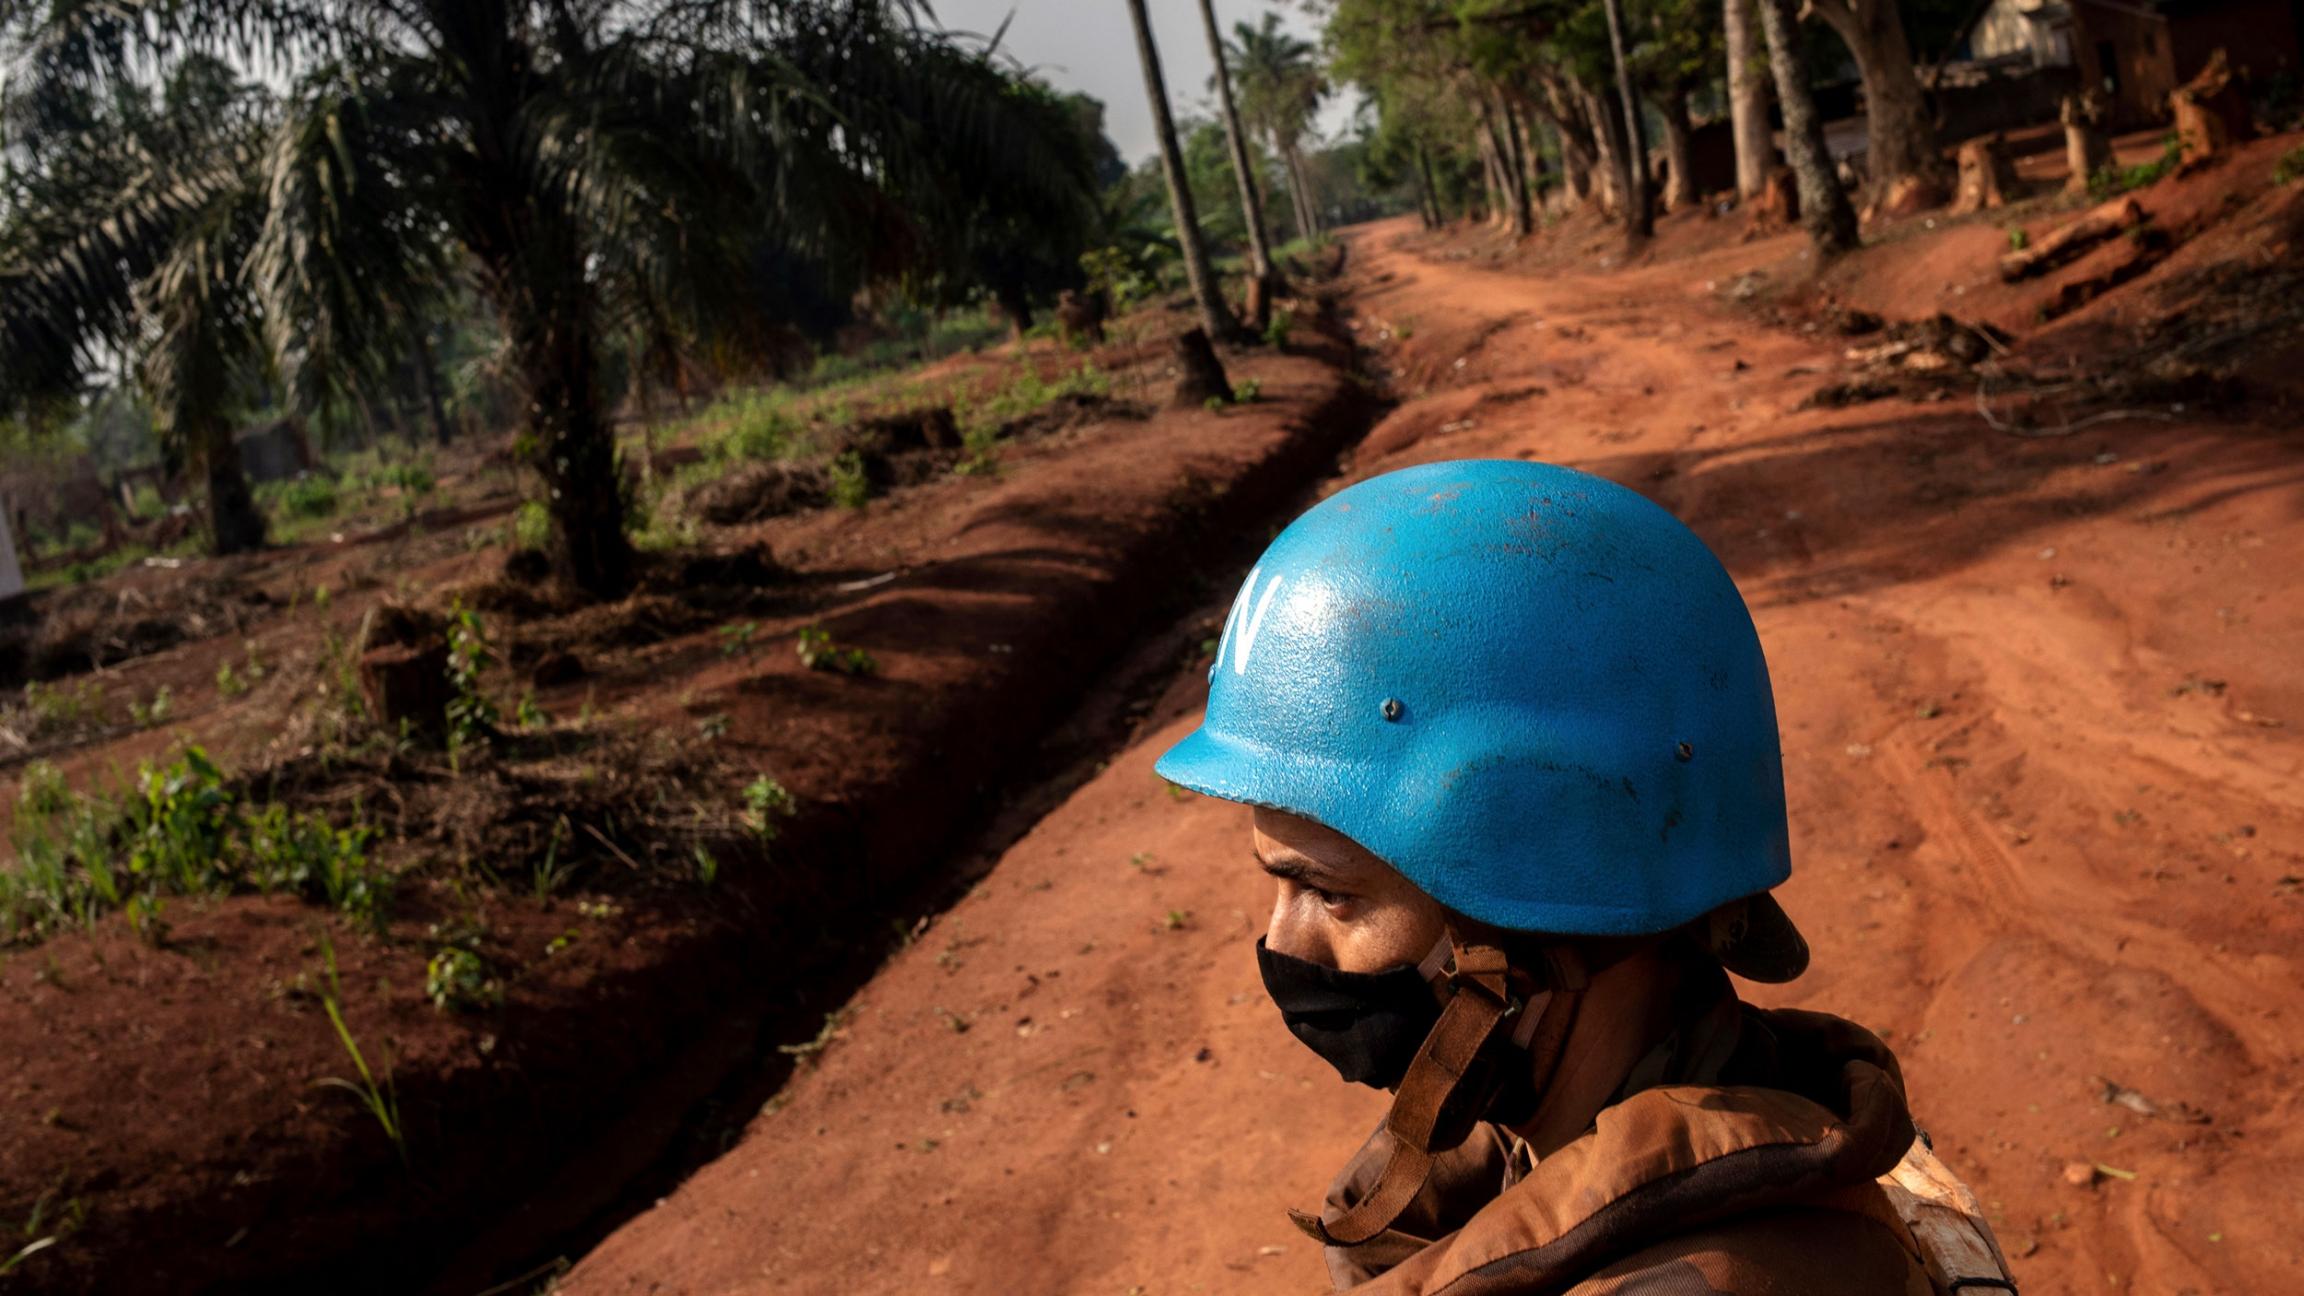 Moroccan UN peacekeepers wearing blue helmets patrol a rich soil road Bangassou, Central African Republic, Feb. 14, 2021.